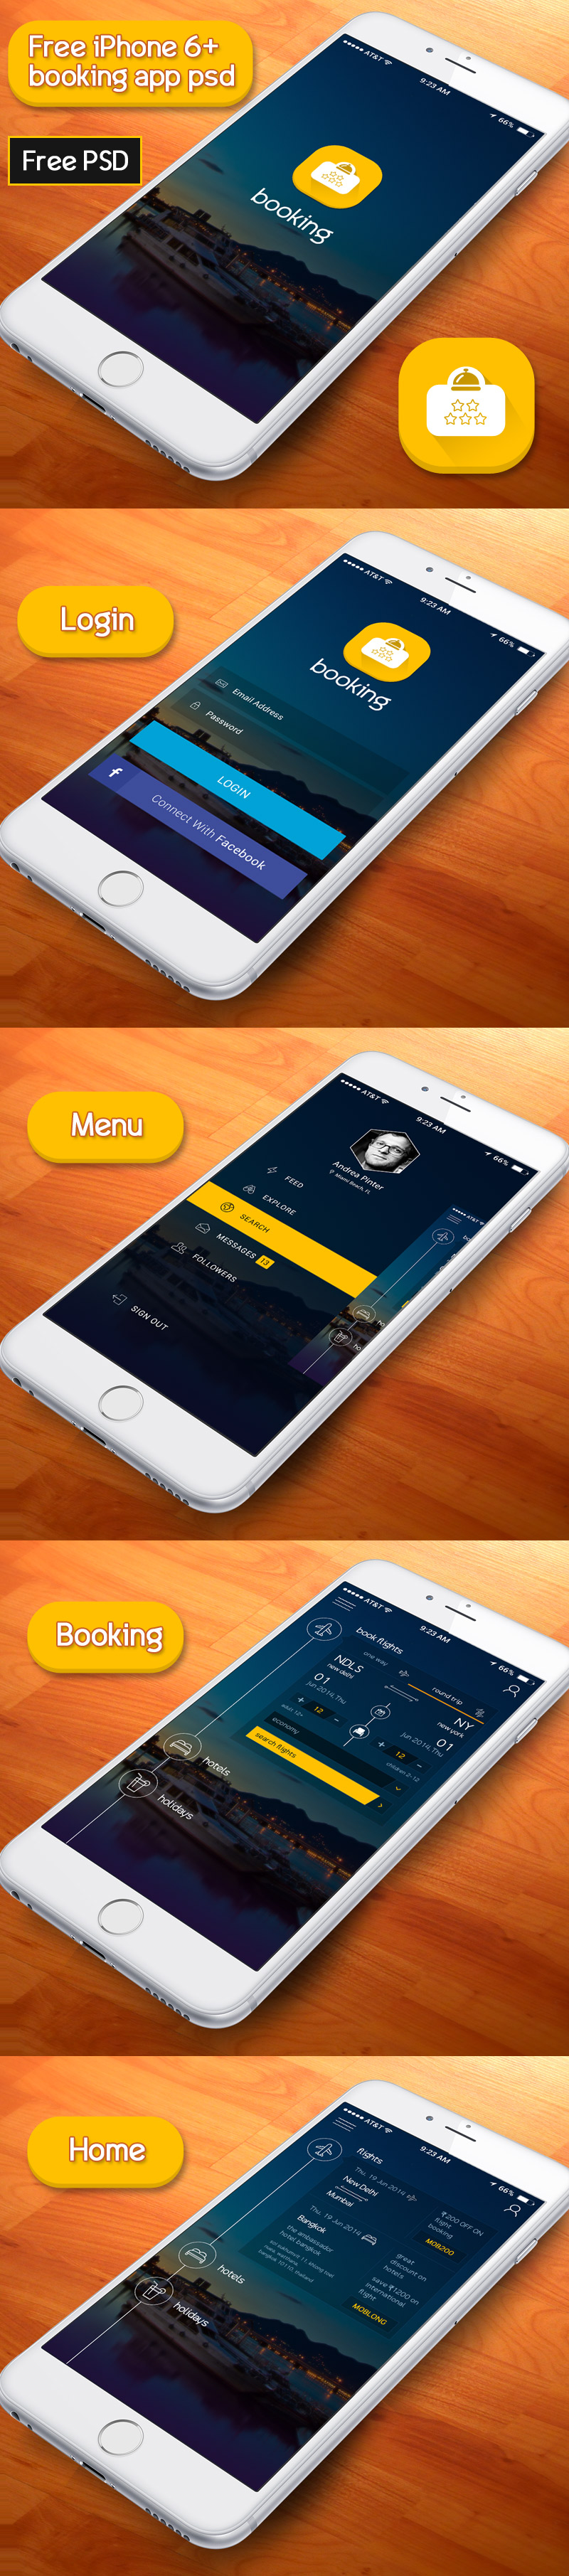 Free App psd